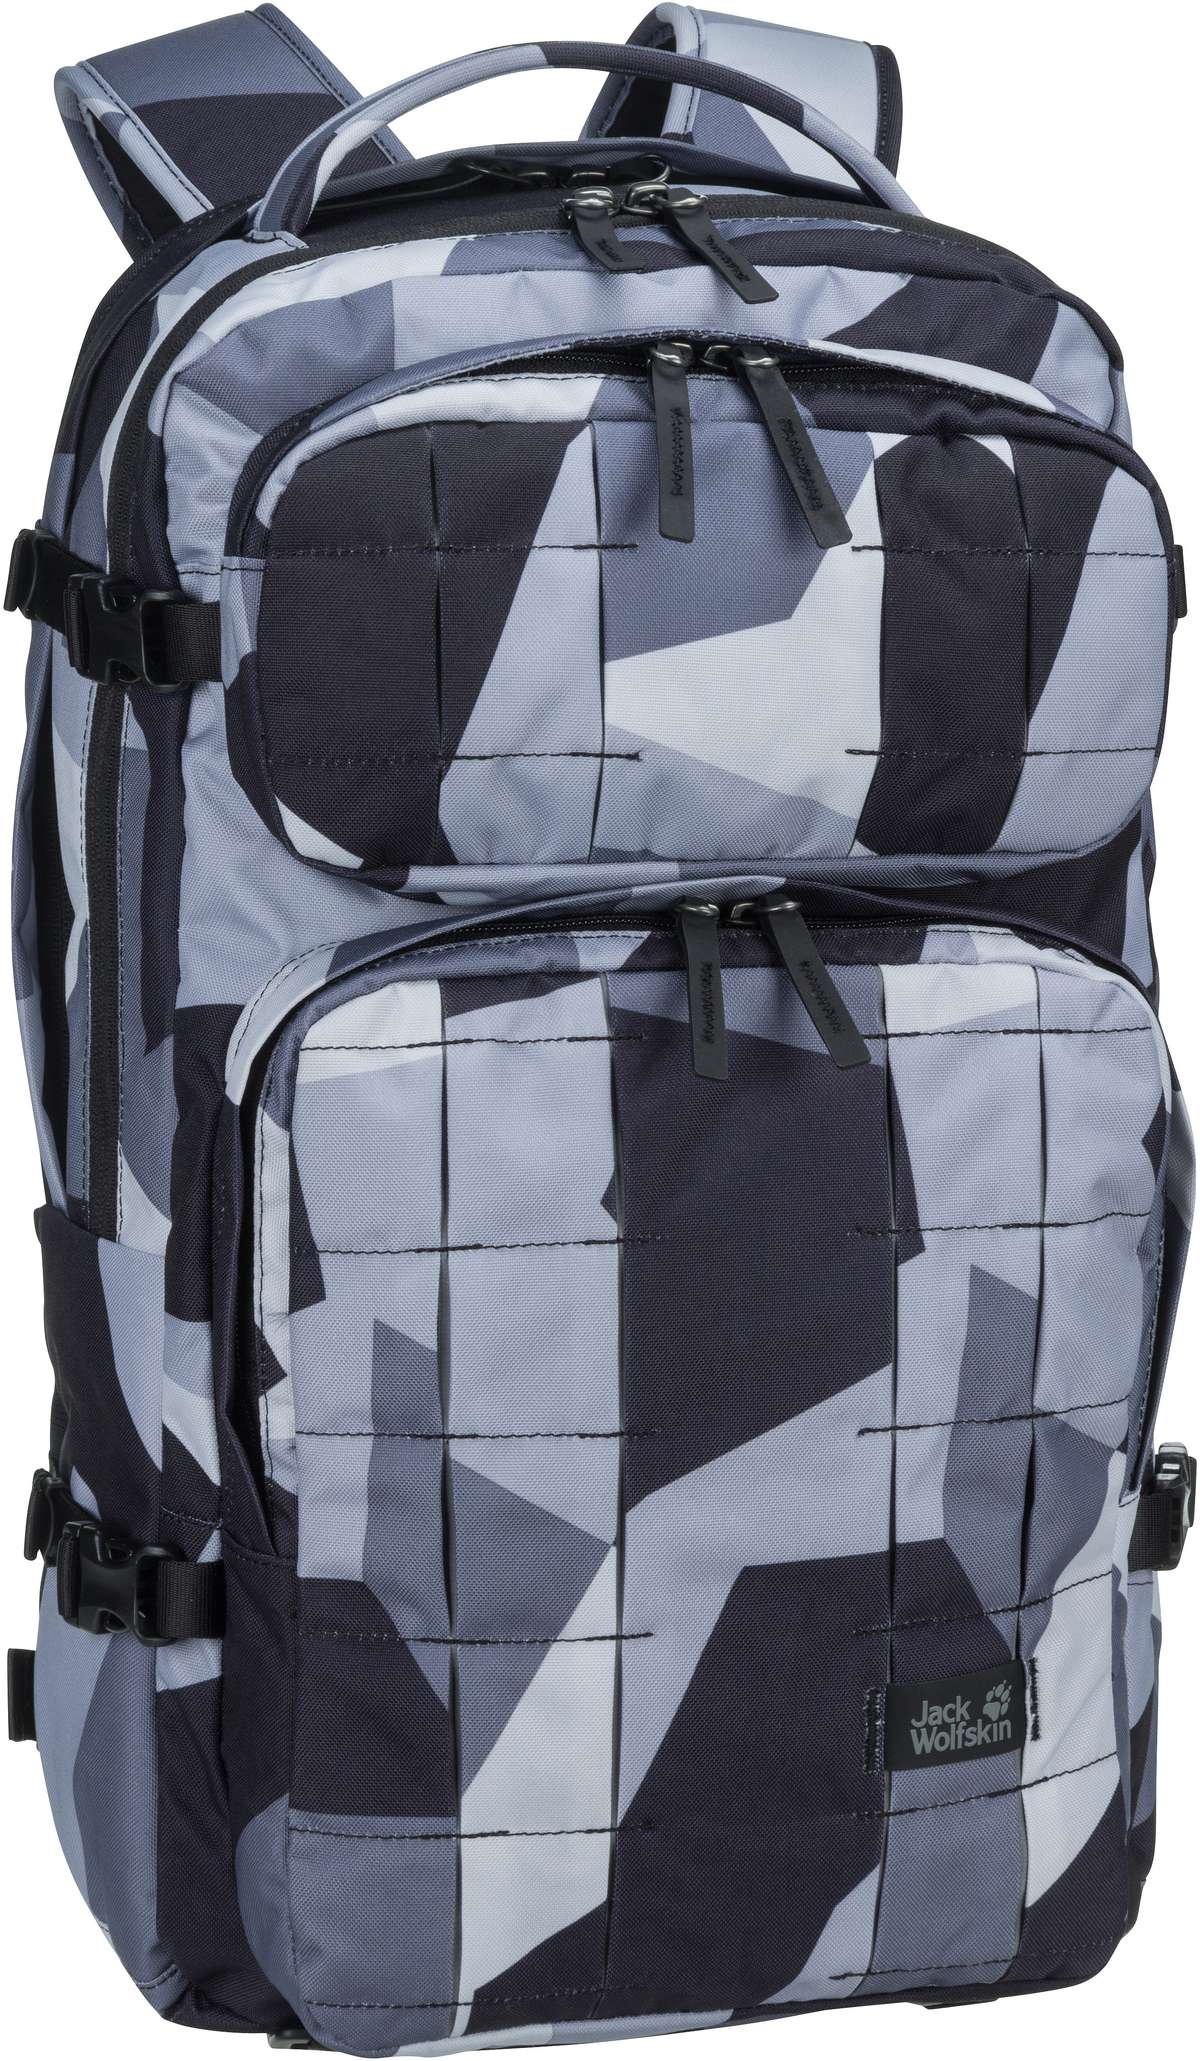 Laptoprucksack TRT 22 Pack Grey Geo Block (22 Liter)